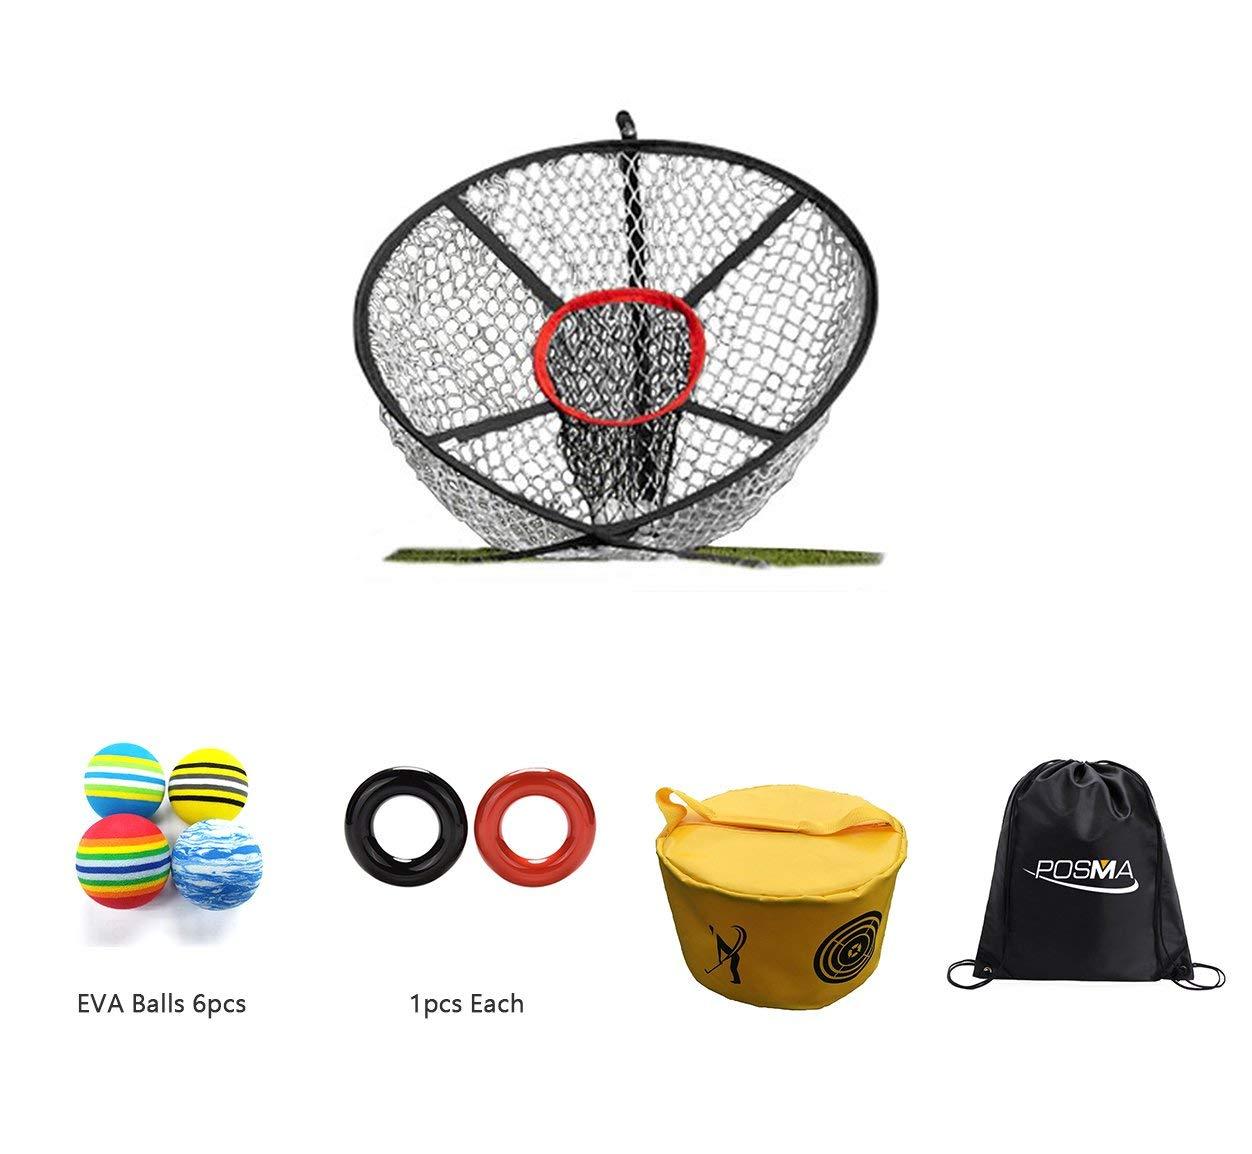 POSMA CN040H Golf Elite Chipping Net Bundle Set With Golf EVA Balls + Weight Power Swing Ring Red and Black(1pcs Each) + Golf Hitting Bag Swing Impact Power Smash Bag + Cinch Sack Carry Bag